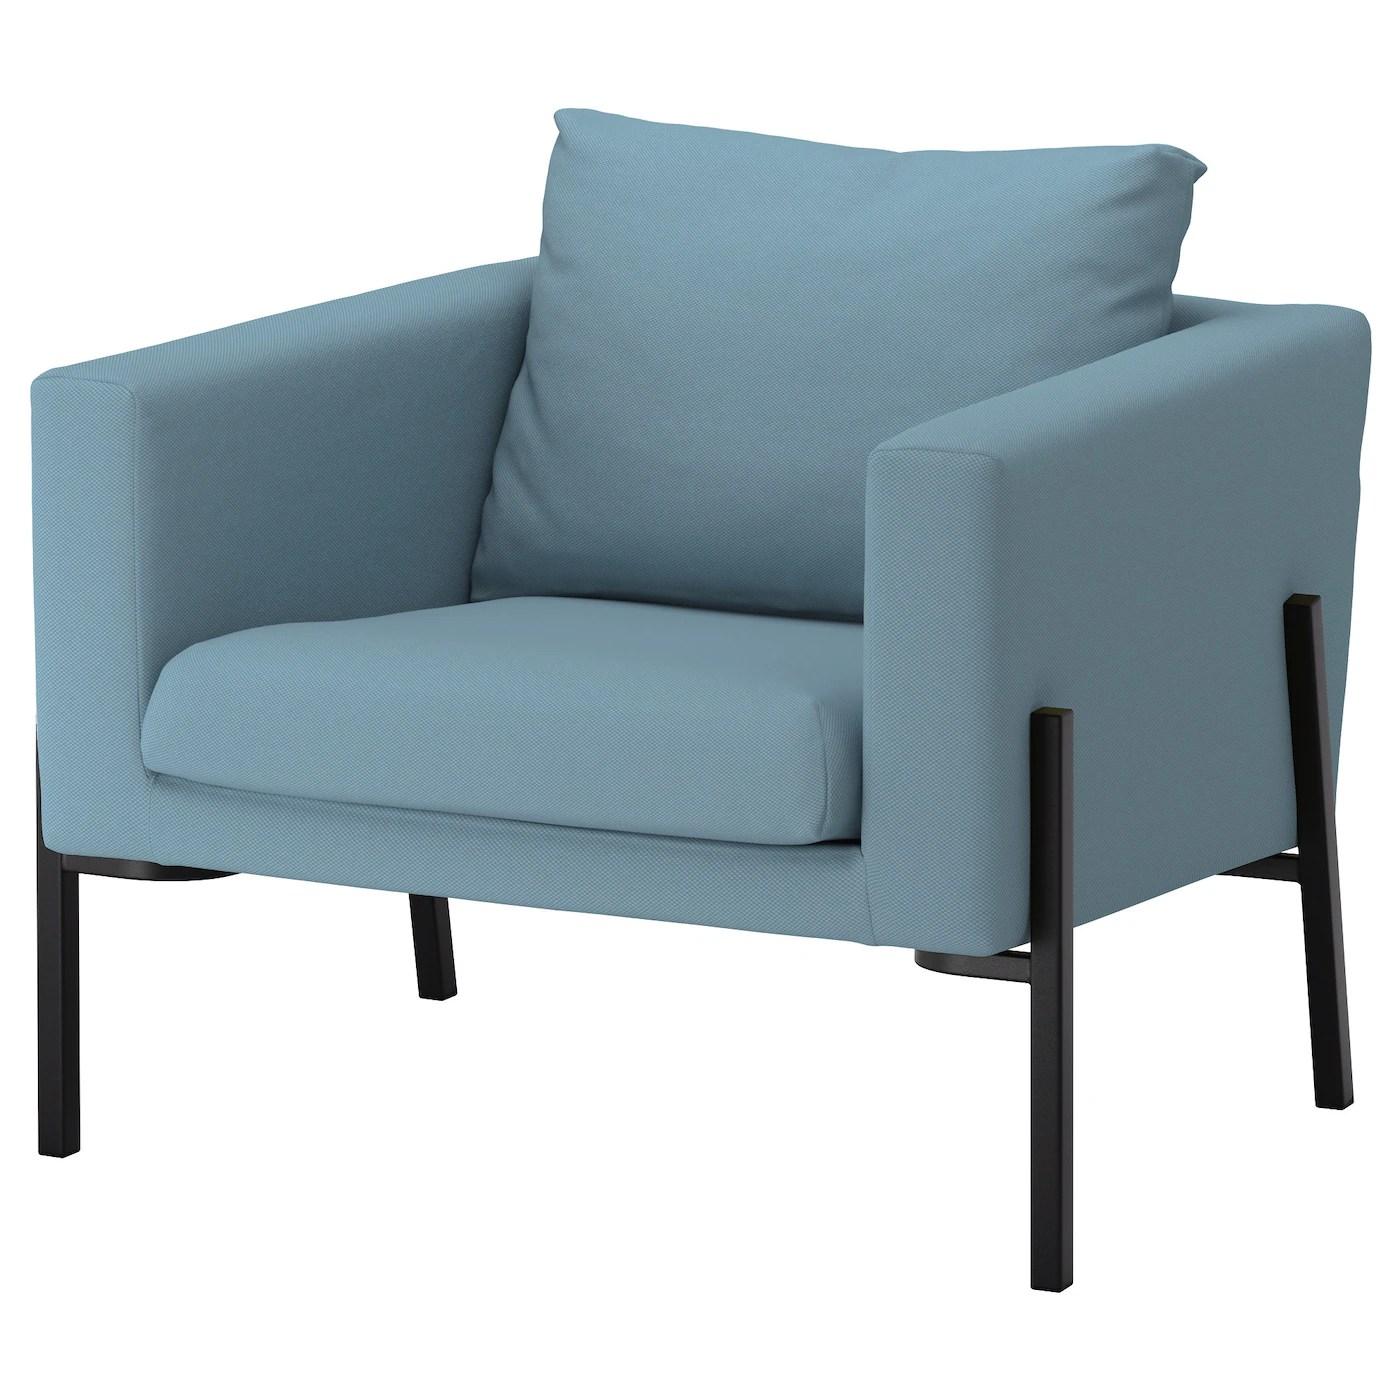 wingback chair covers ireland wedding and tablecloths fabric armchairs ikea dublin